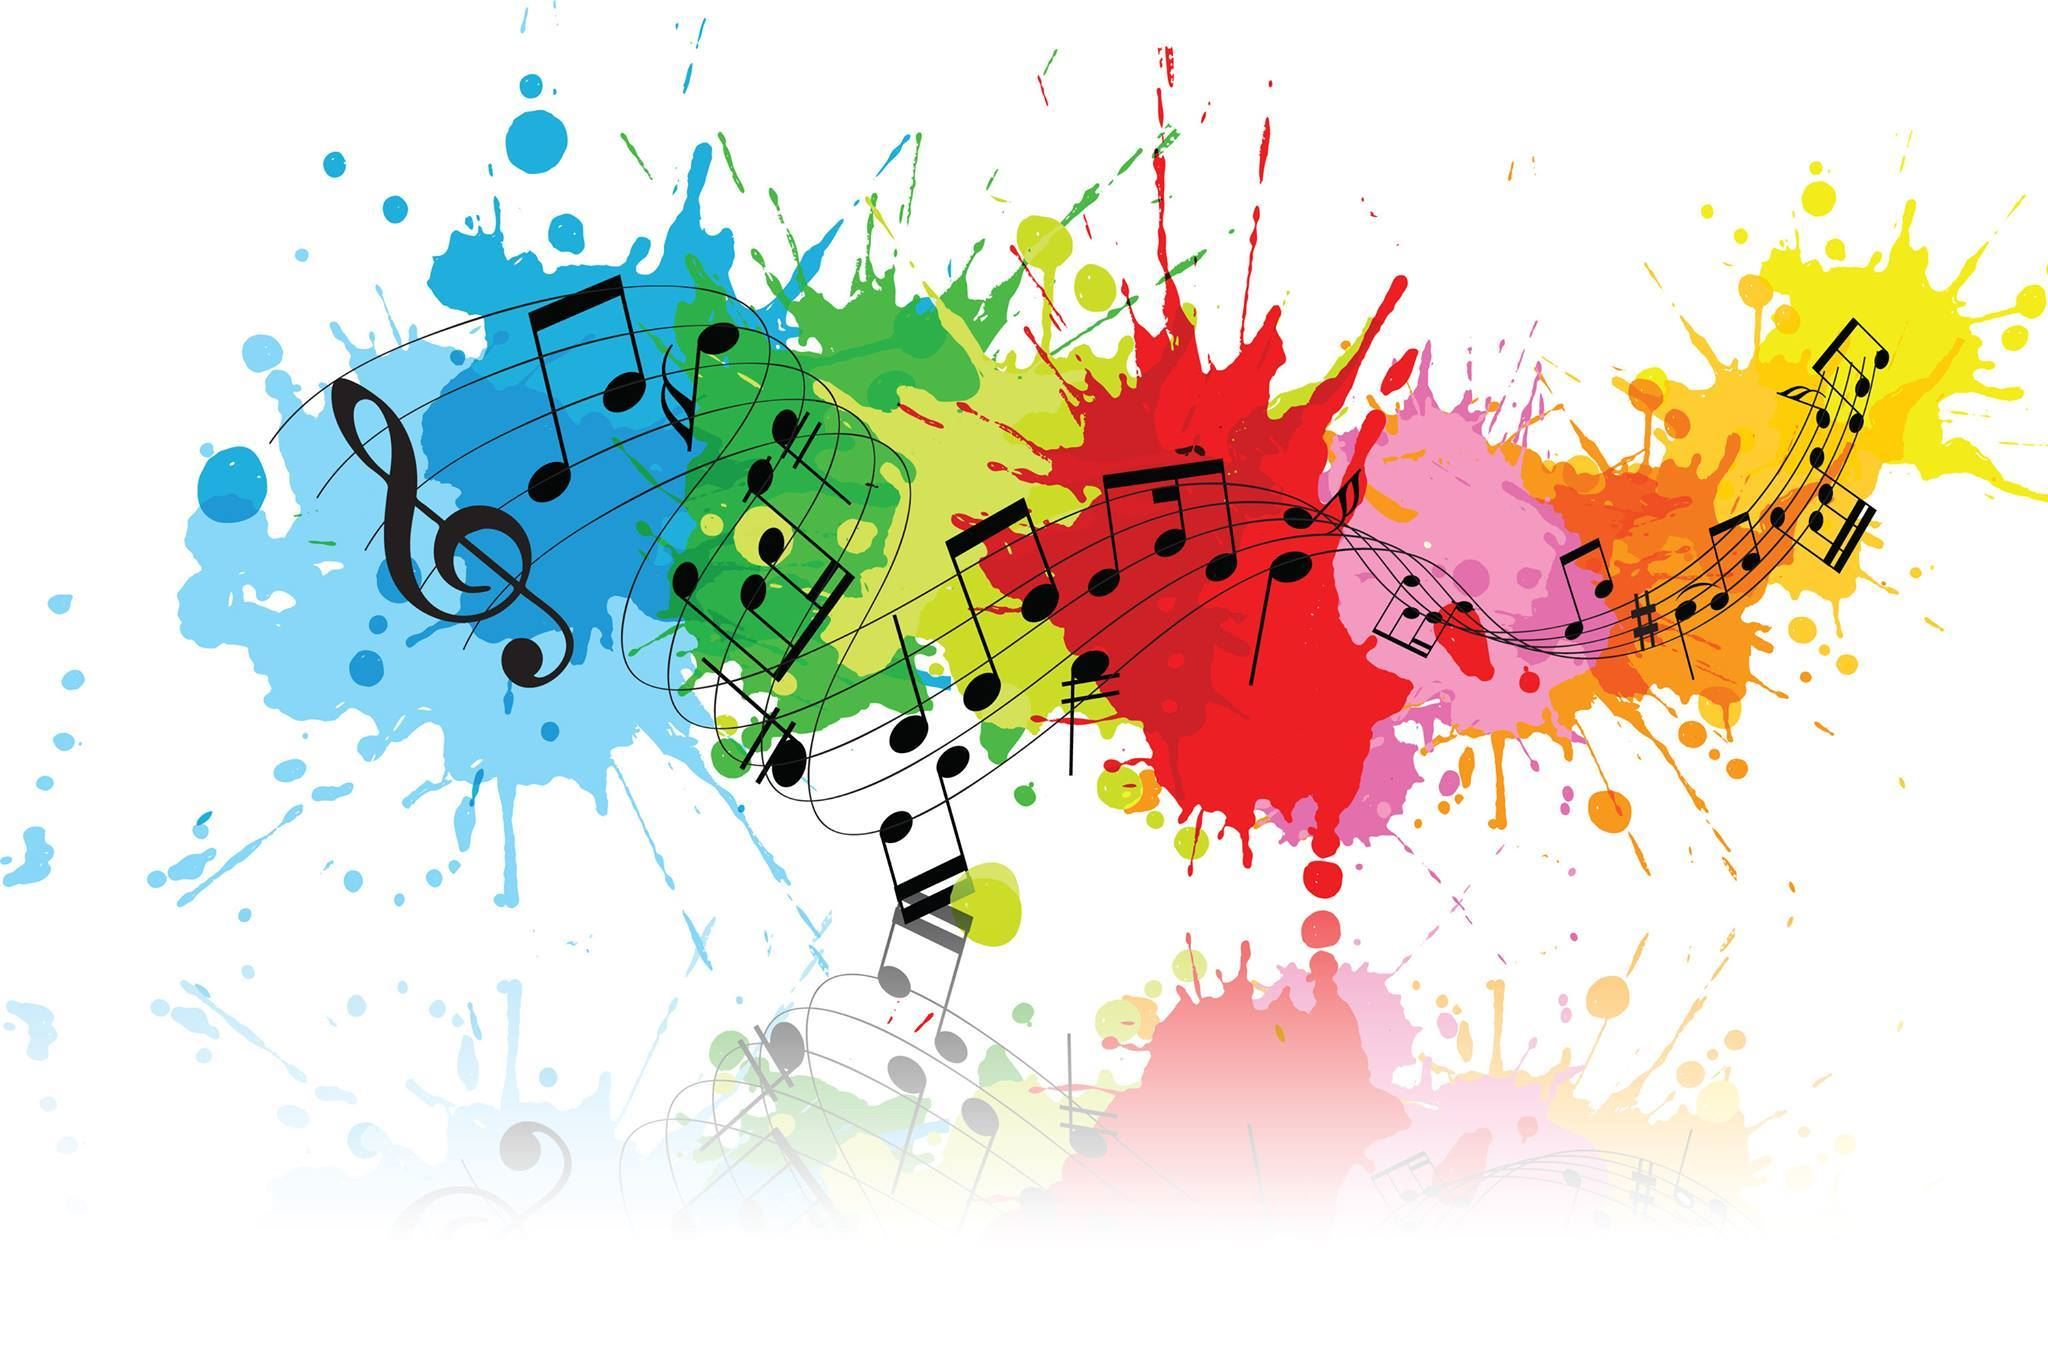 Musik i sommarkvällen,  © Musik i sommarkvällen, Musik i sommarkvällen